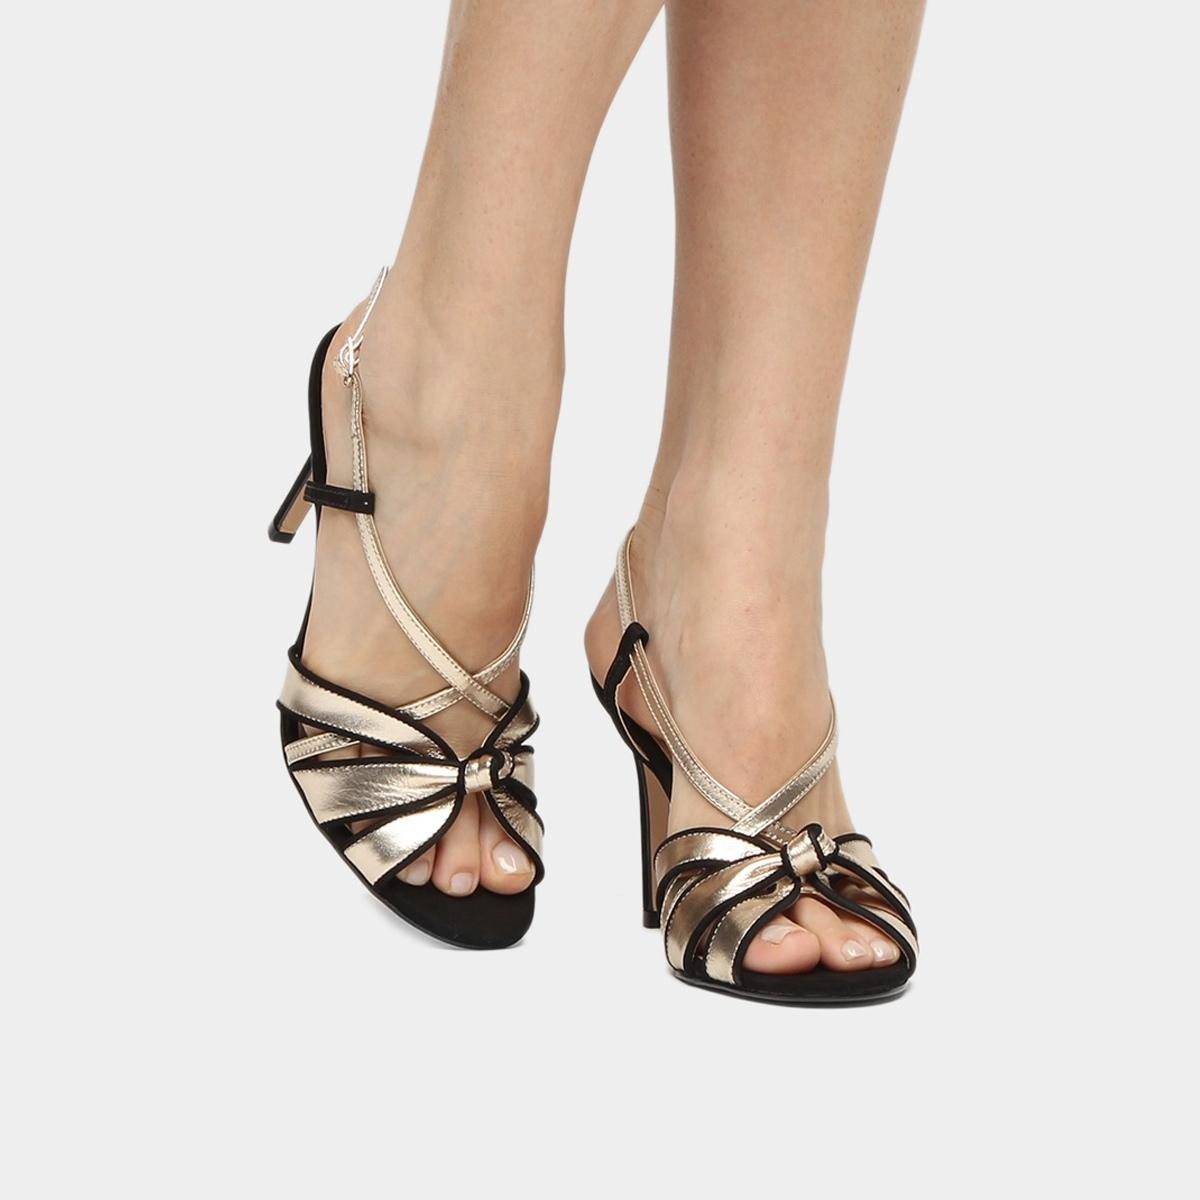 9dc974740 sandália couro shoestock salto fino nó feminina. Carregando zoom.